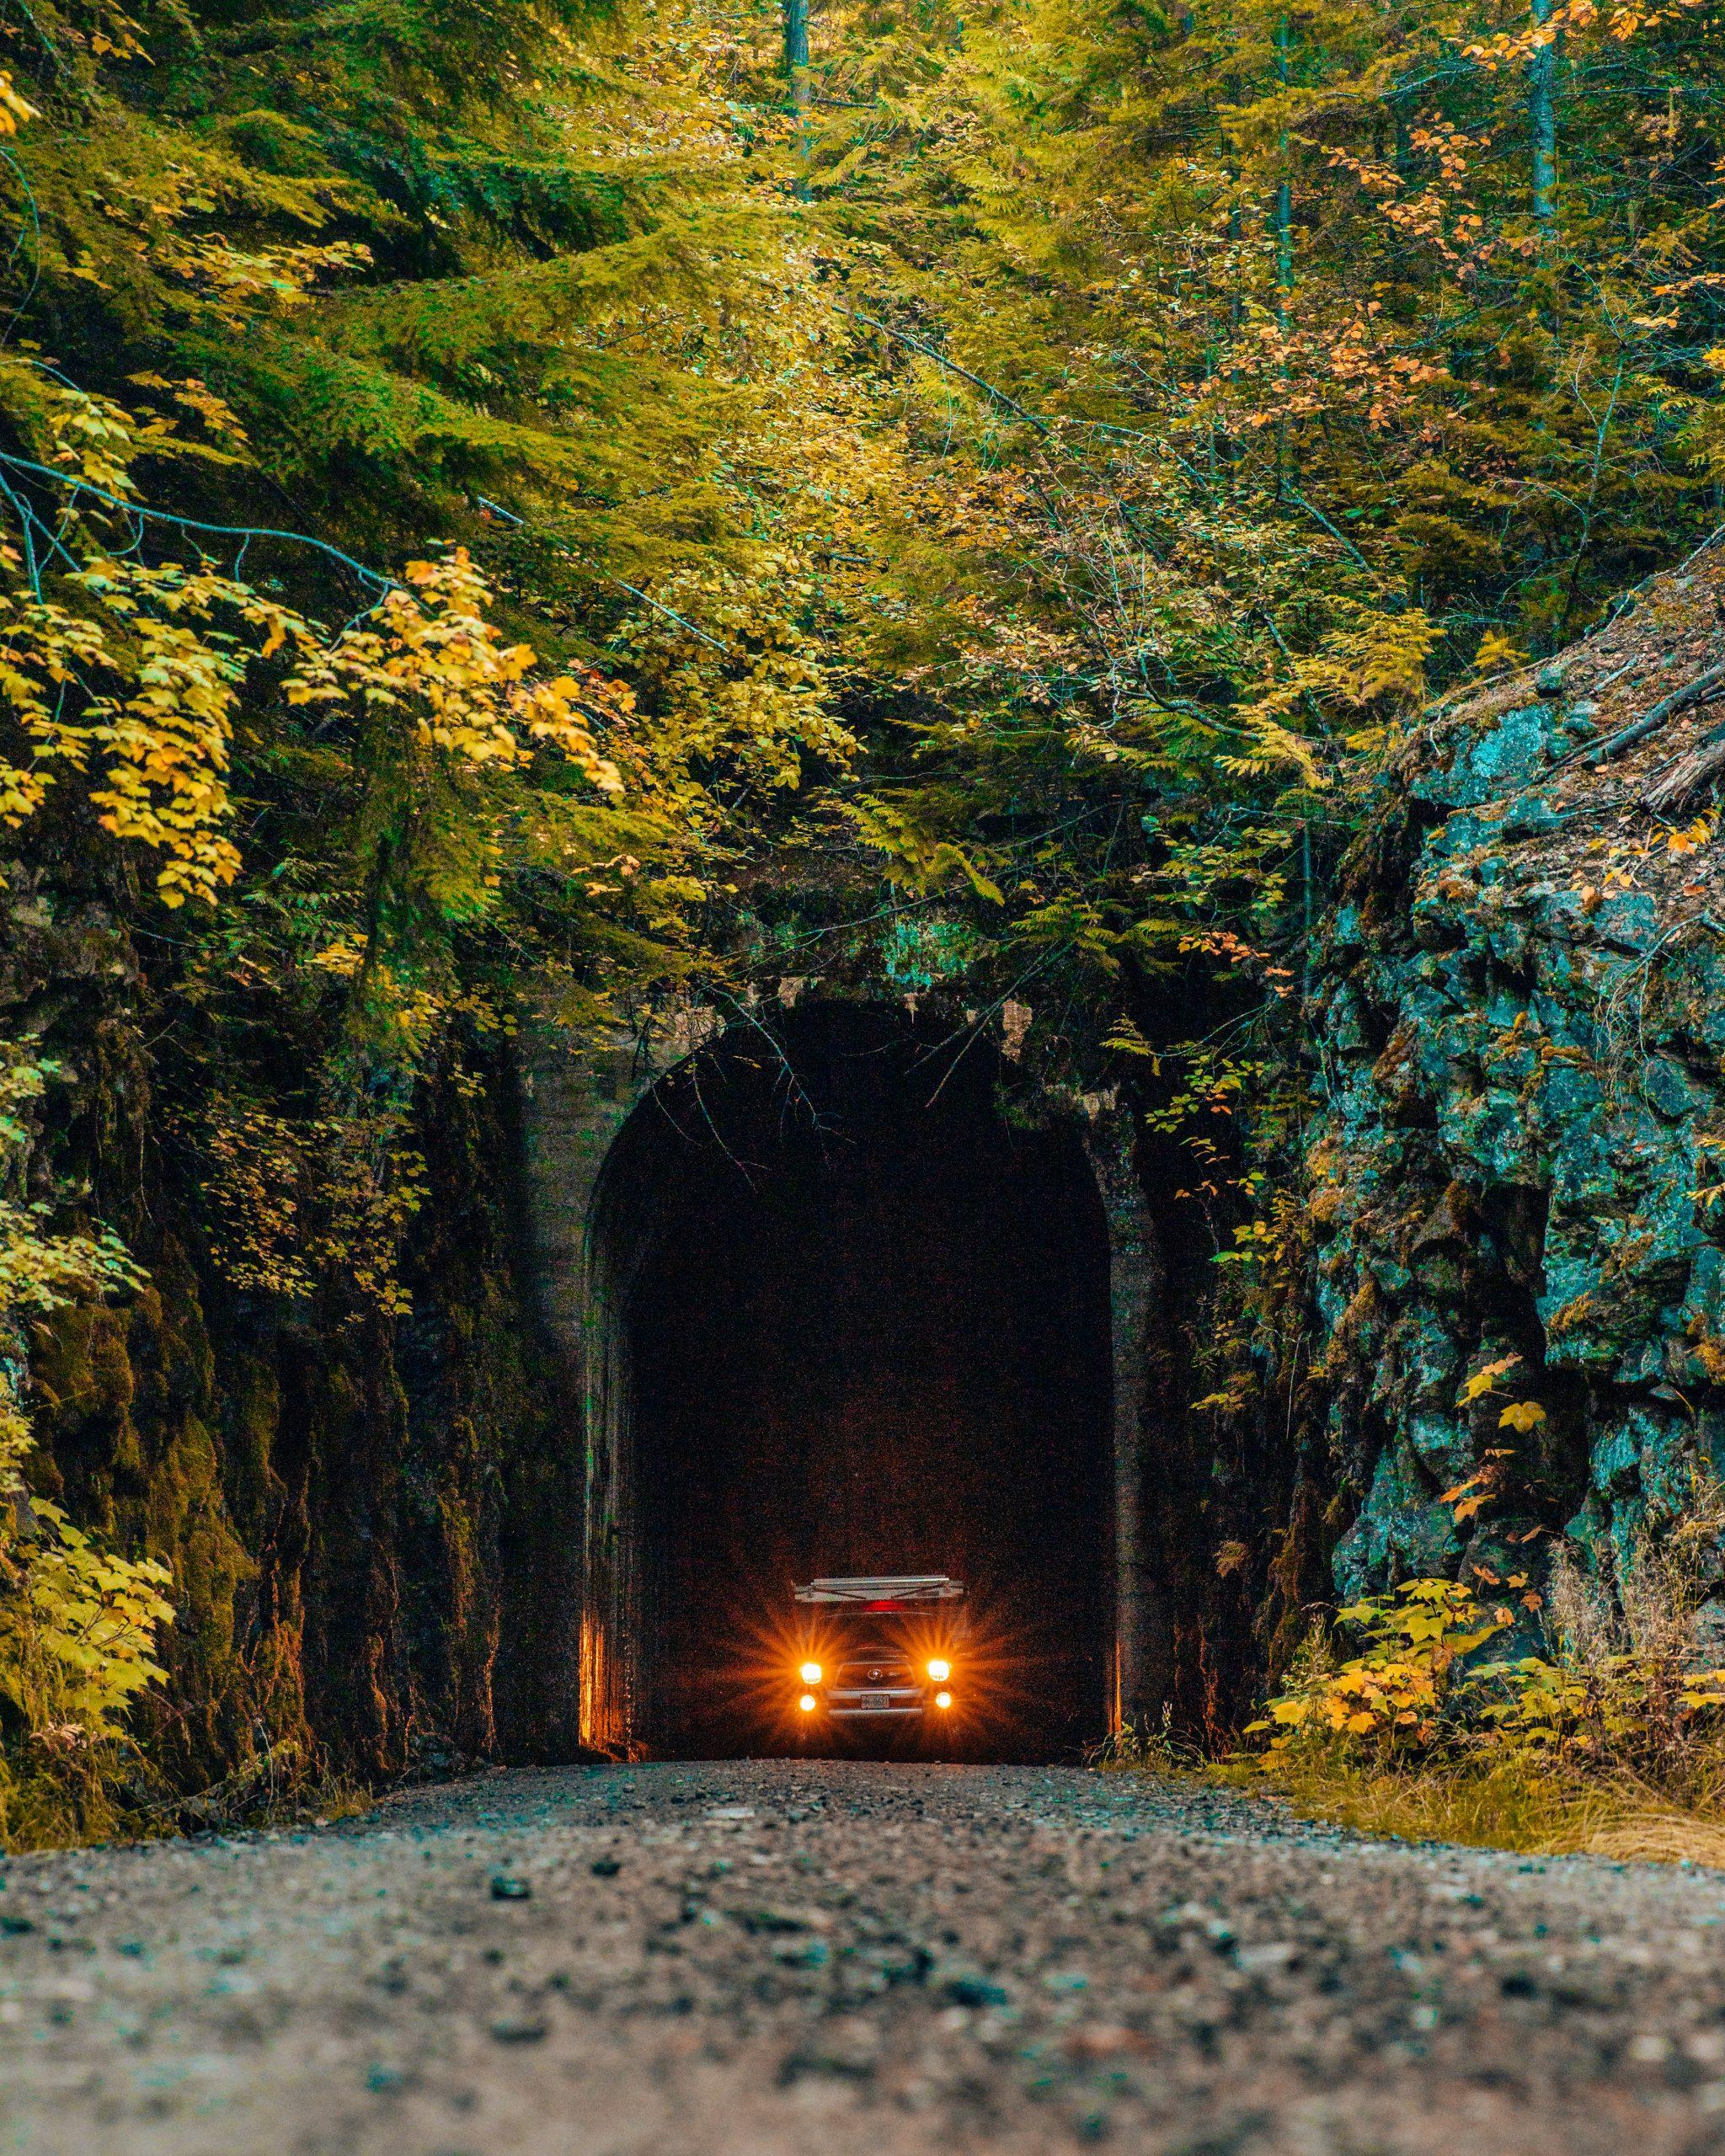 Truck in Bulldog Tunnel Entrance British Columbia